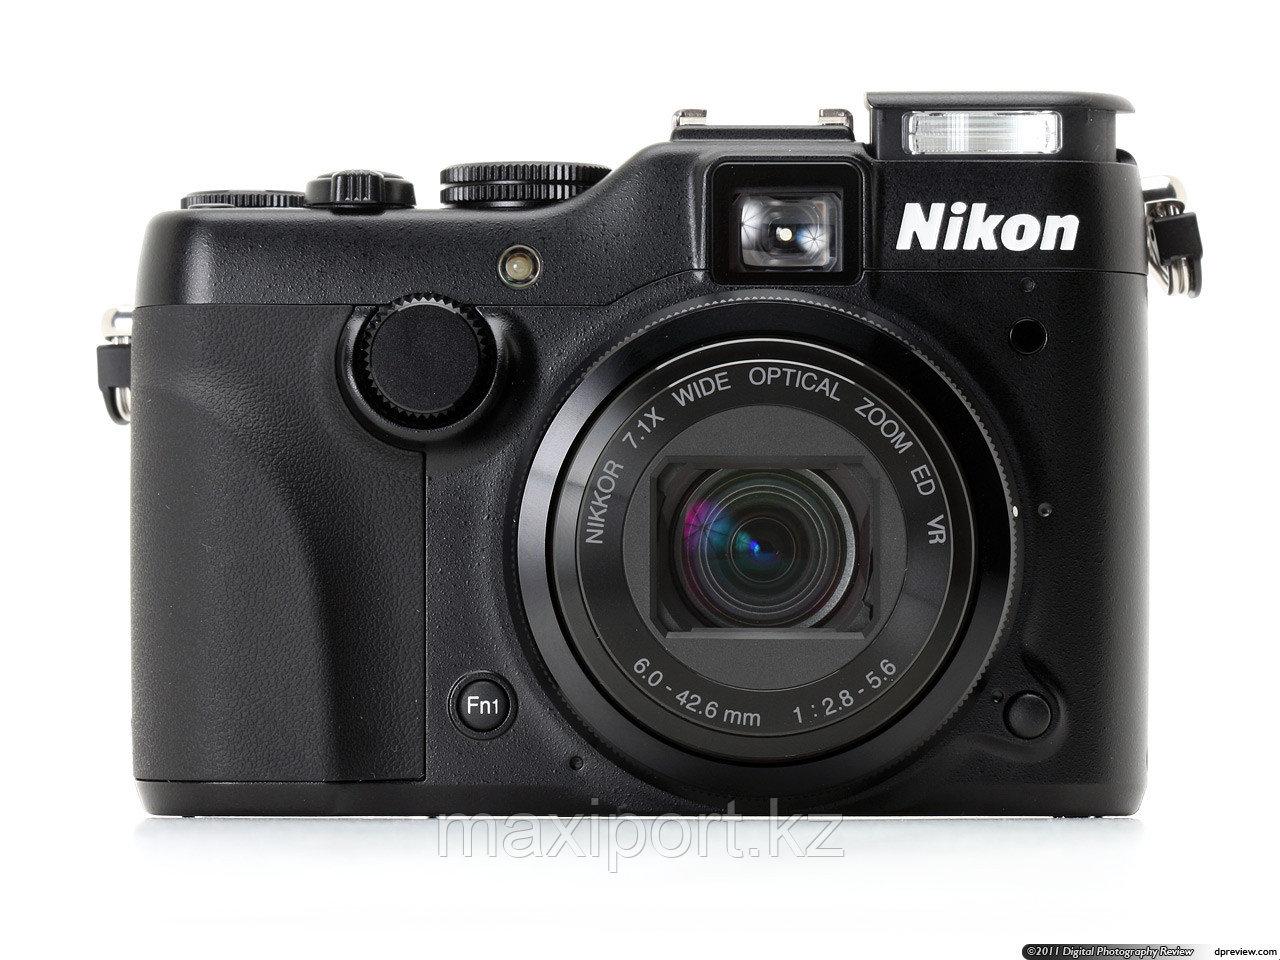 Nikon P7100 японская сборка